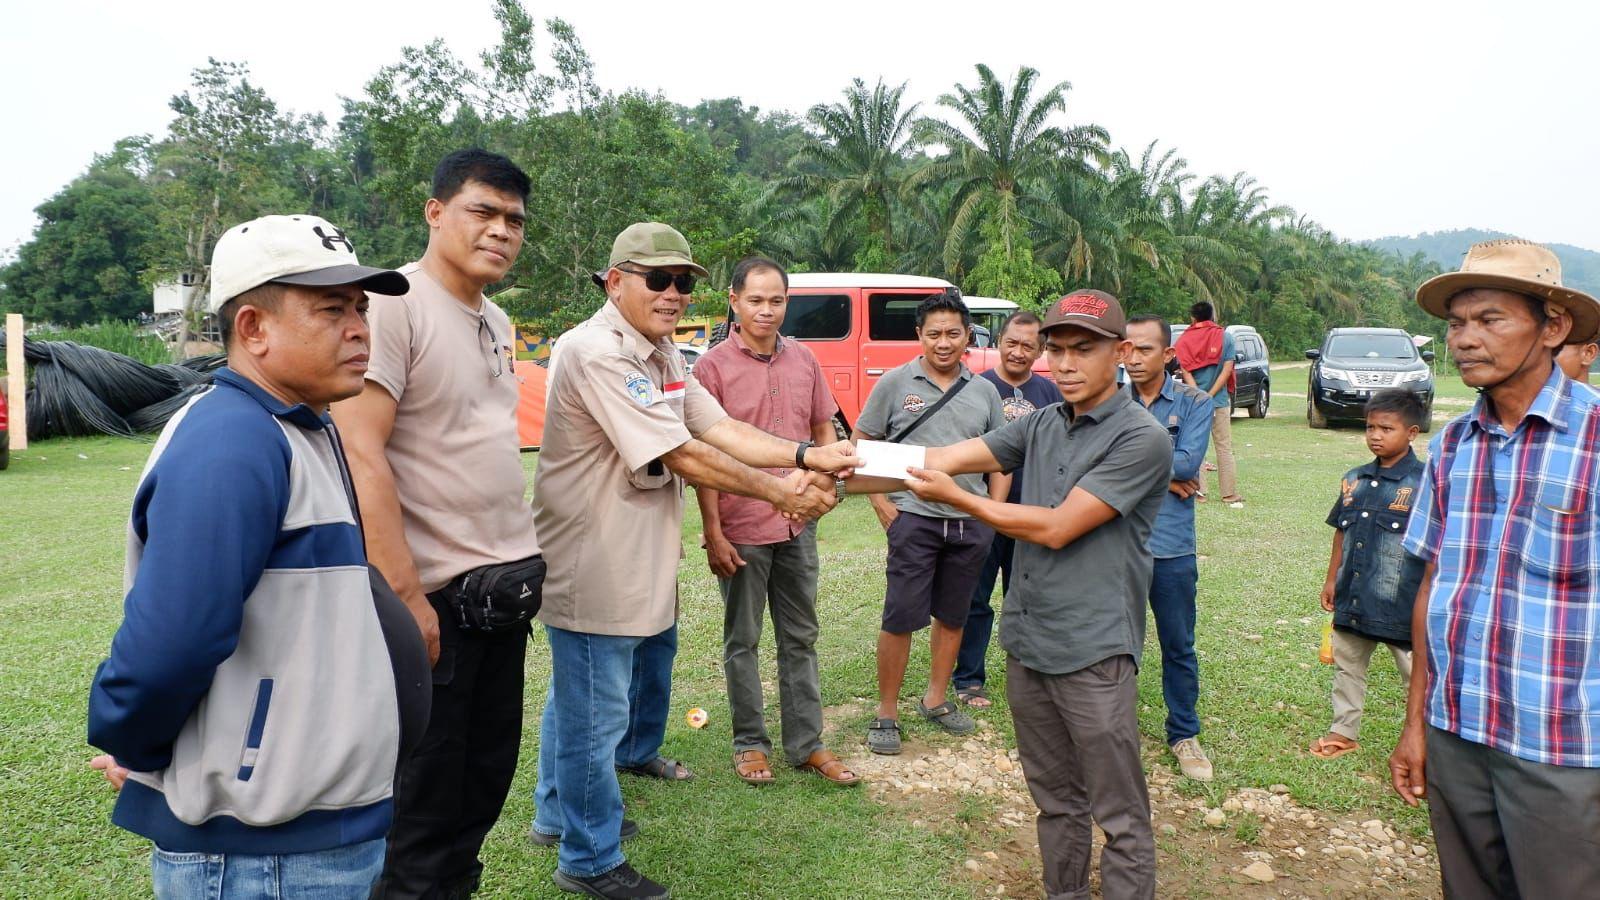 Desa Binaan Diterpa Bencana Banjir,TLCI 2 Riau Droping Bansos Dan Gerakkan Perekonomian Warga